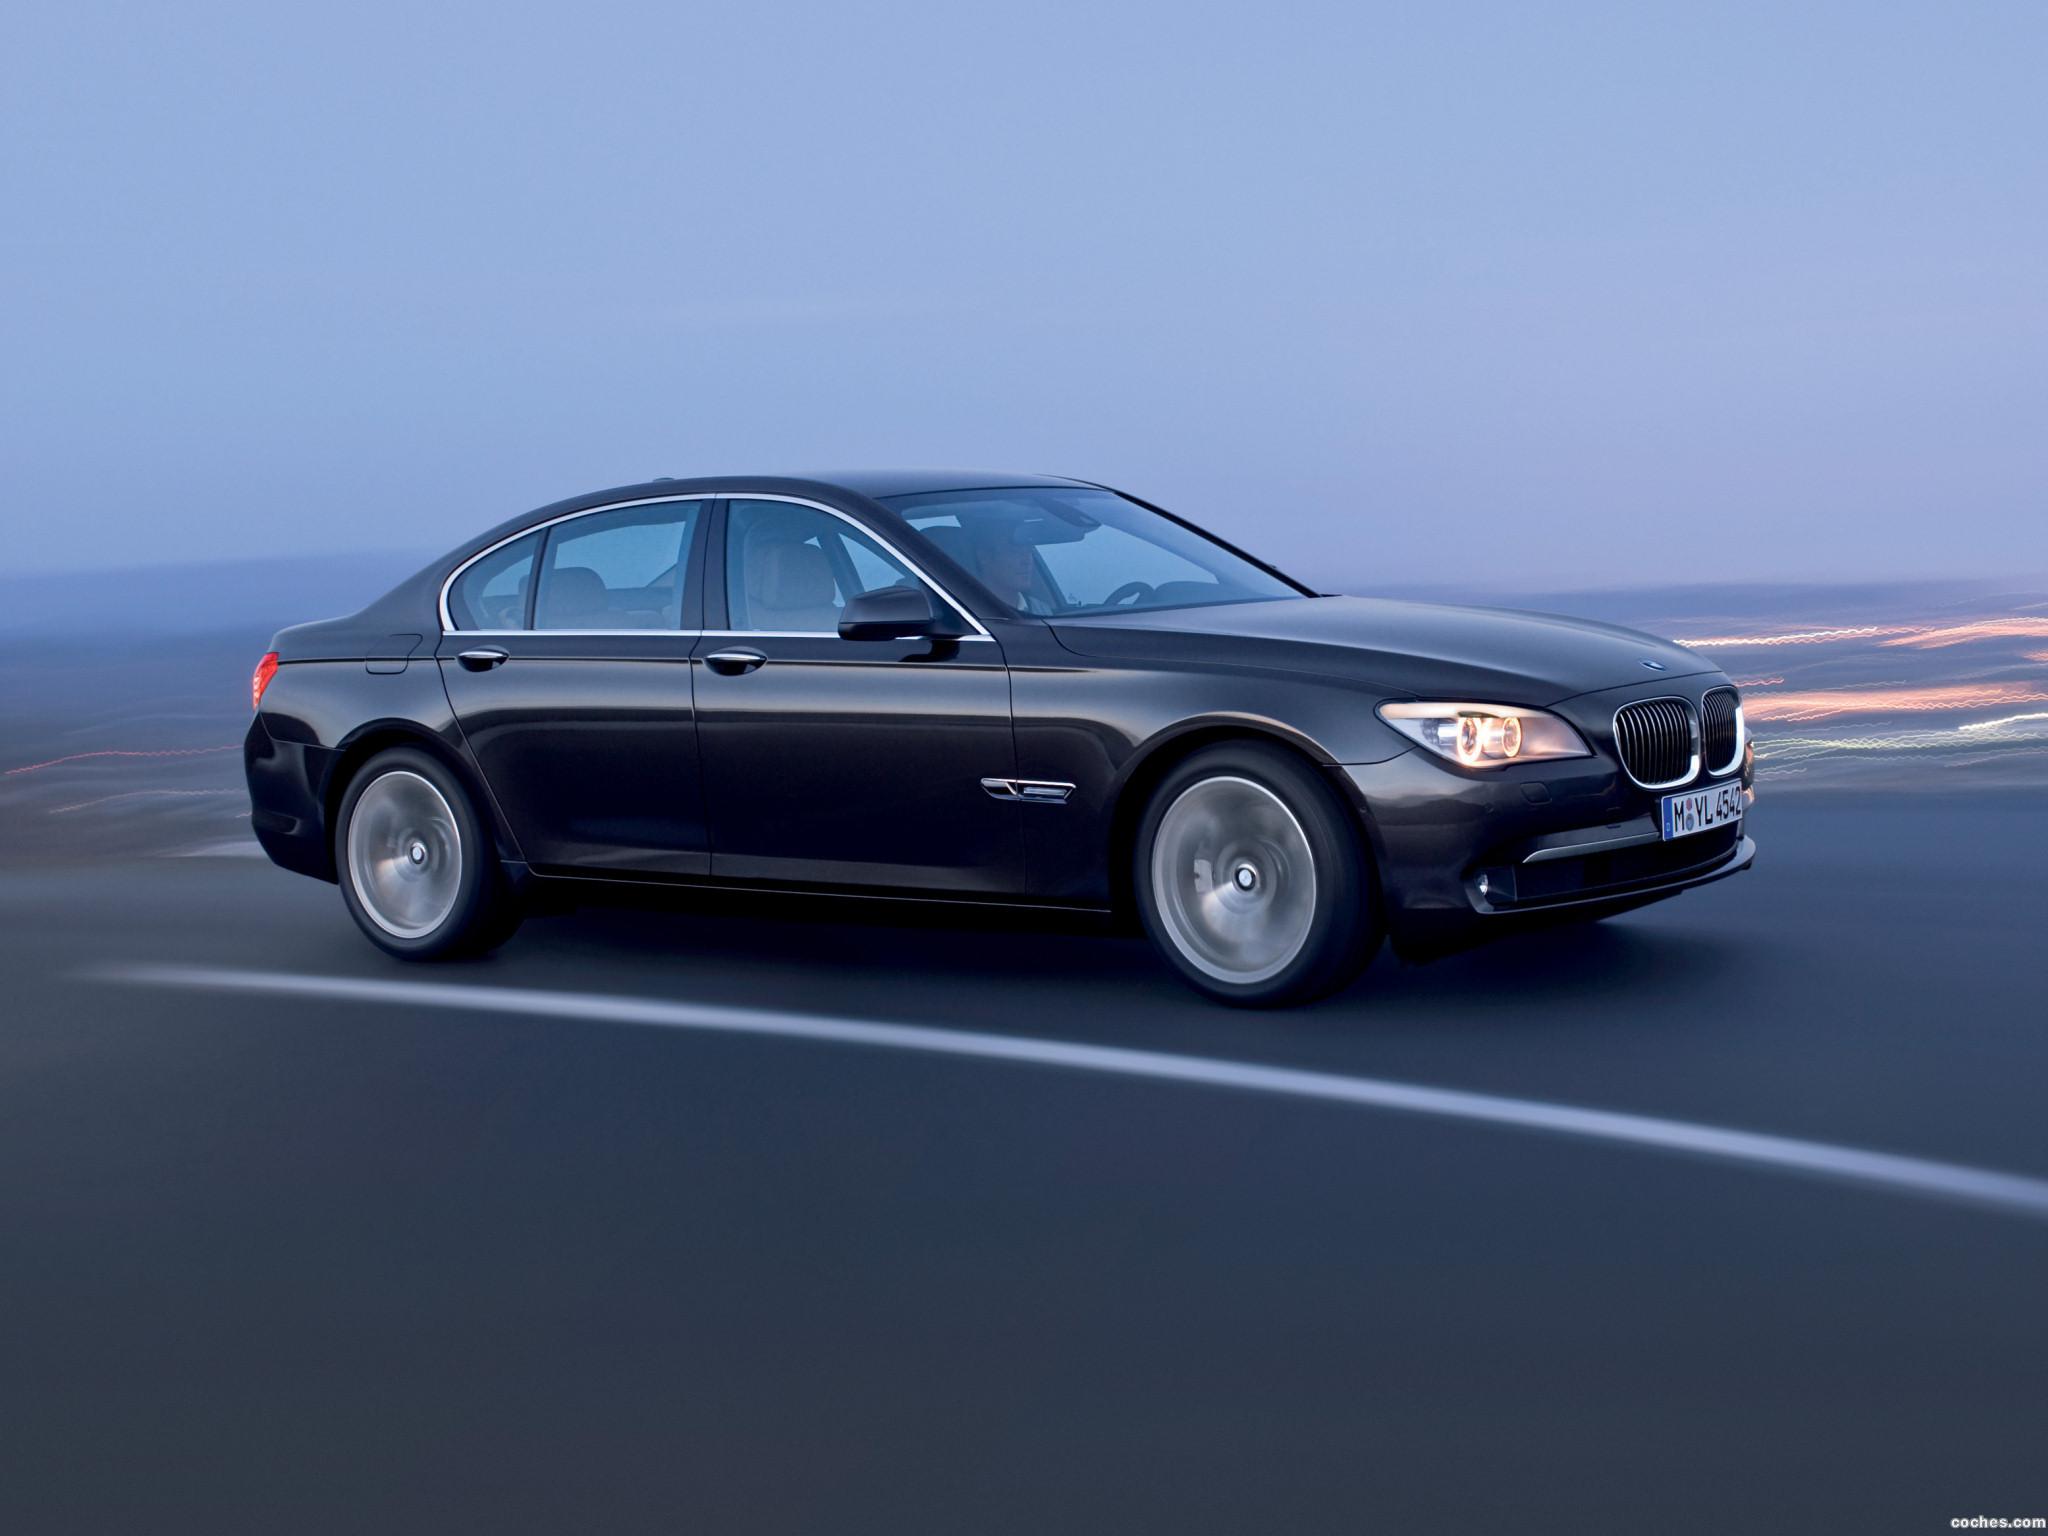 Foto 2 de BMW Serie 7 F01 2009